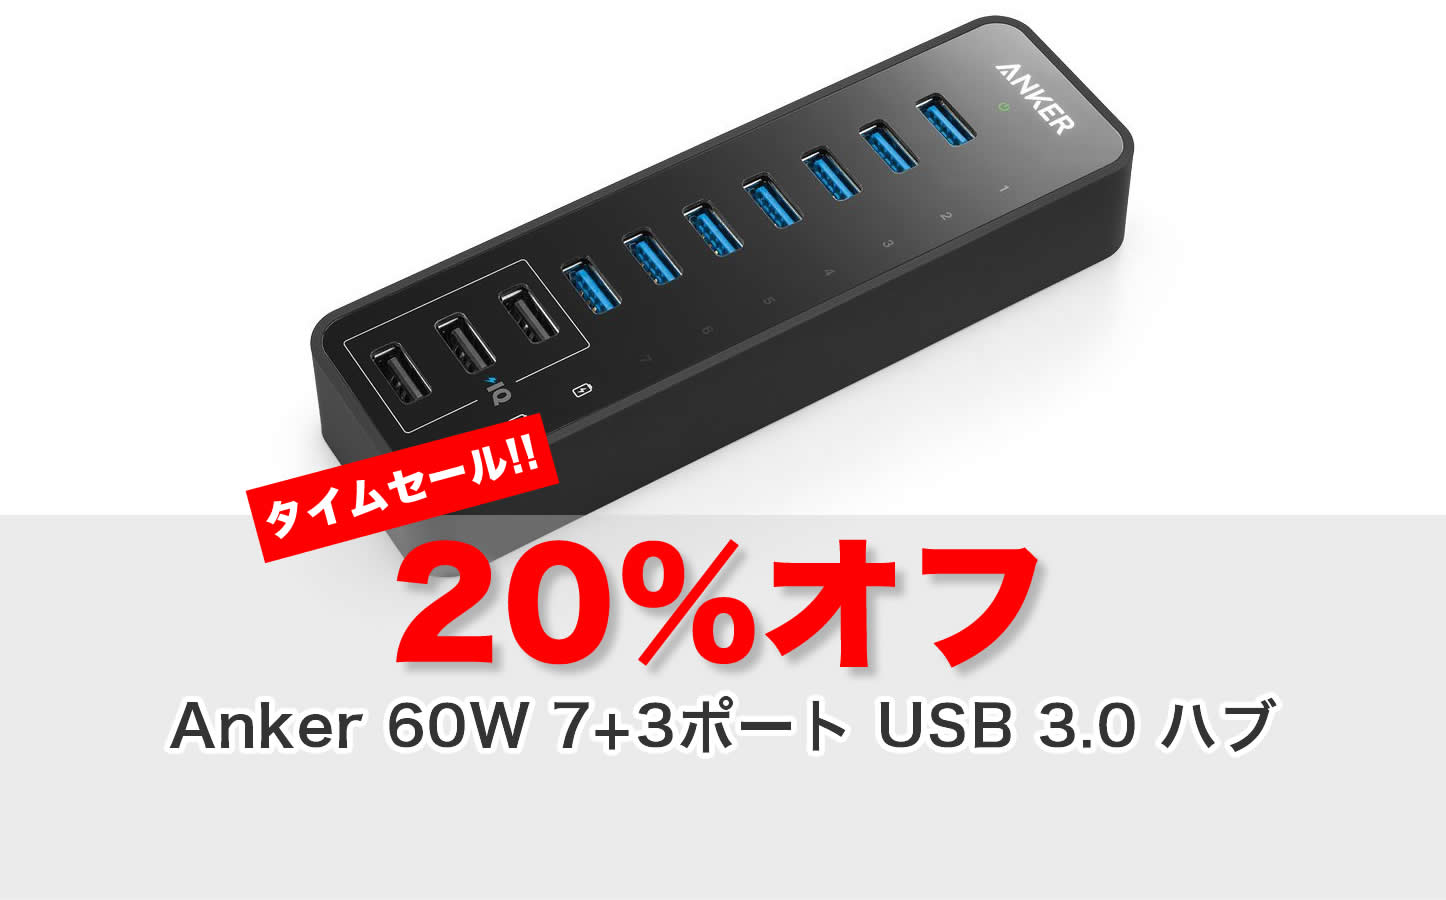 USB Hub Sale